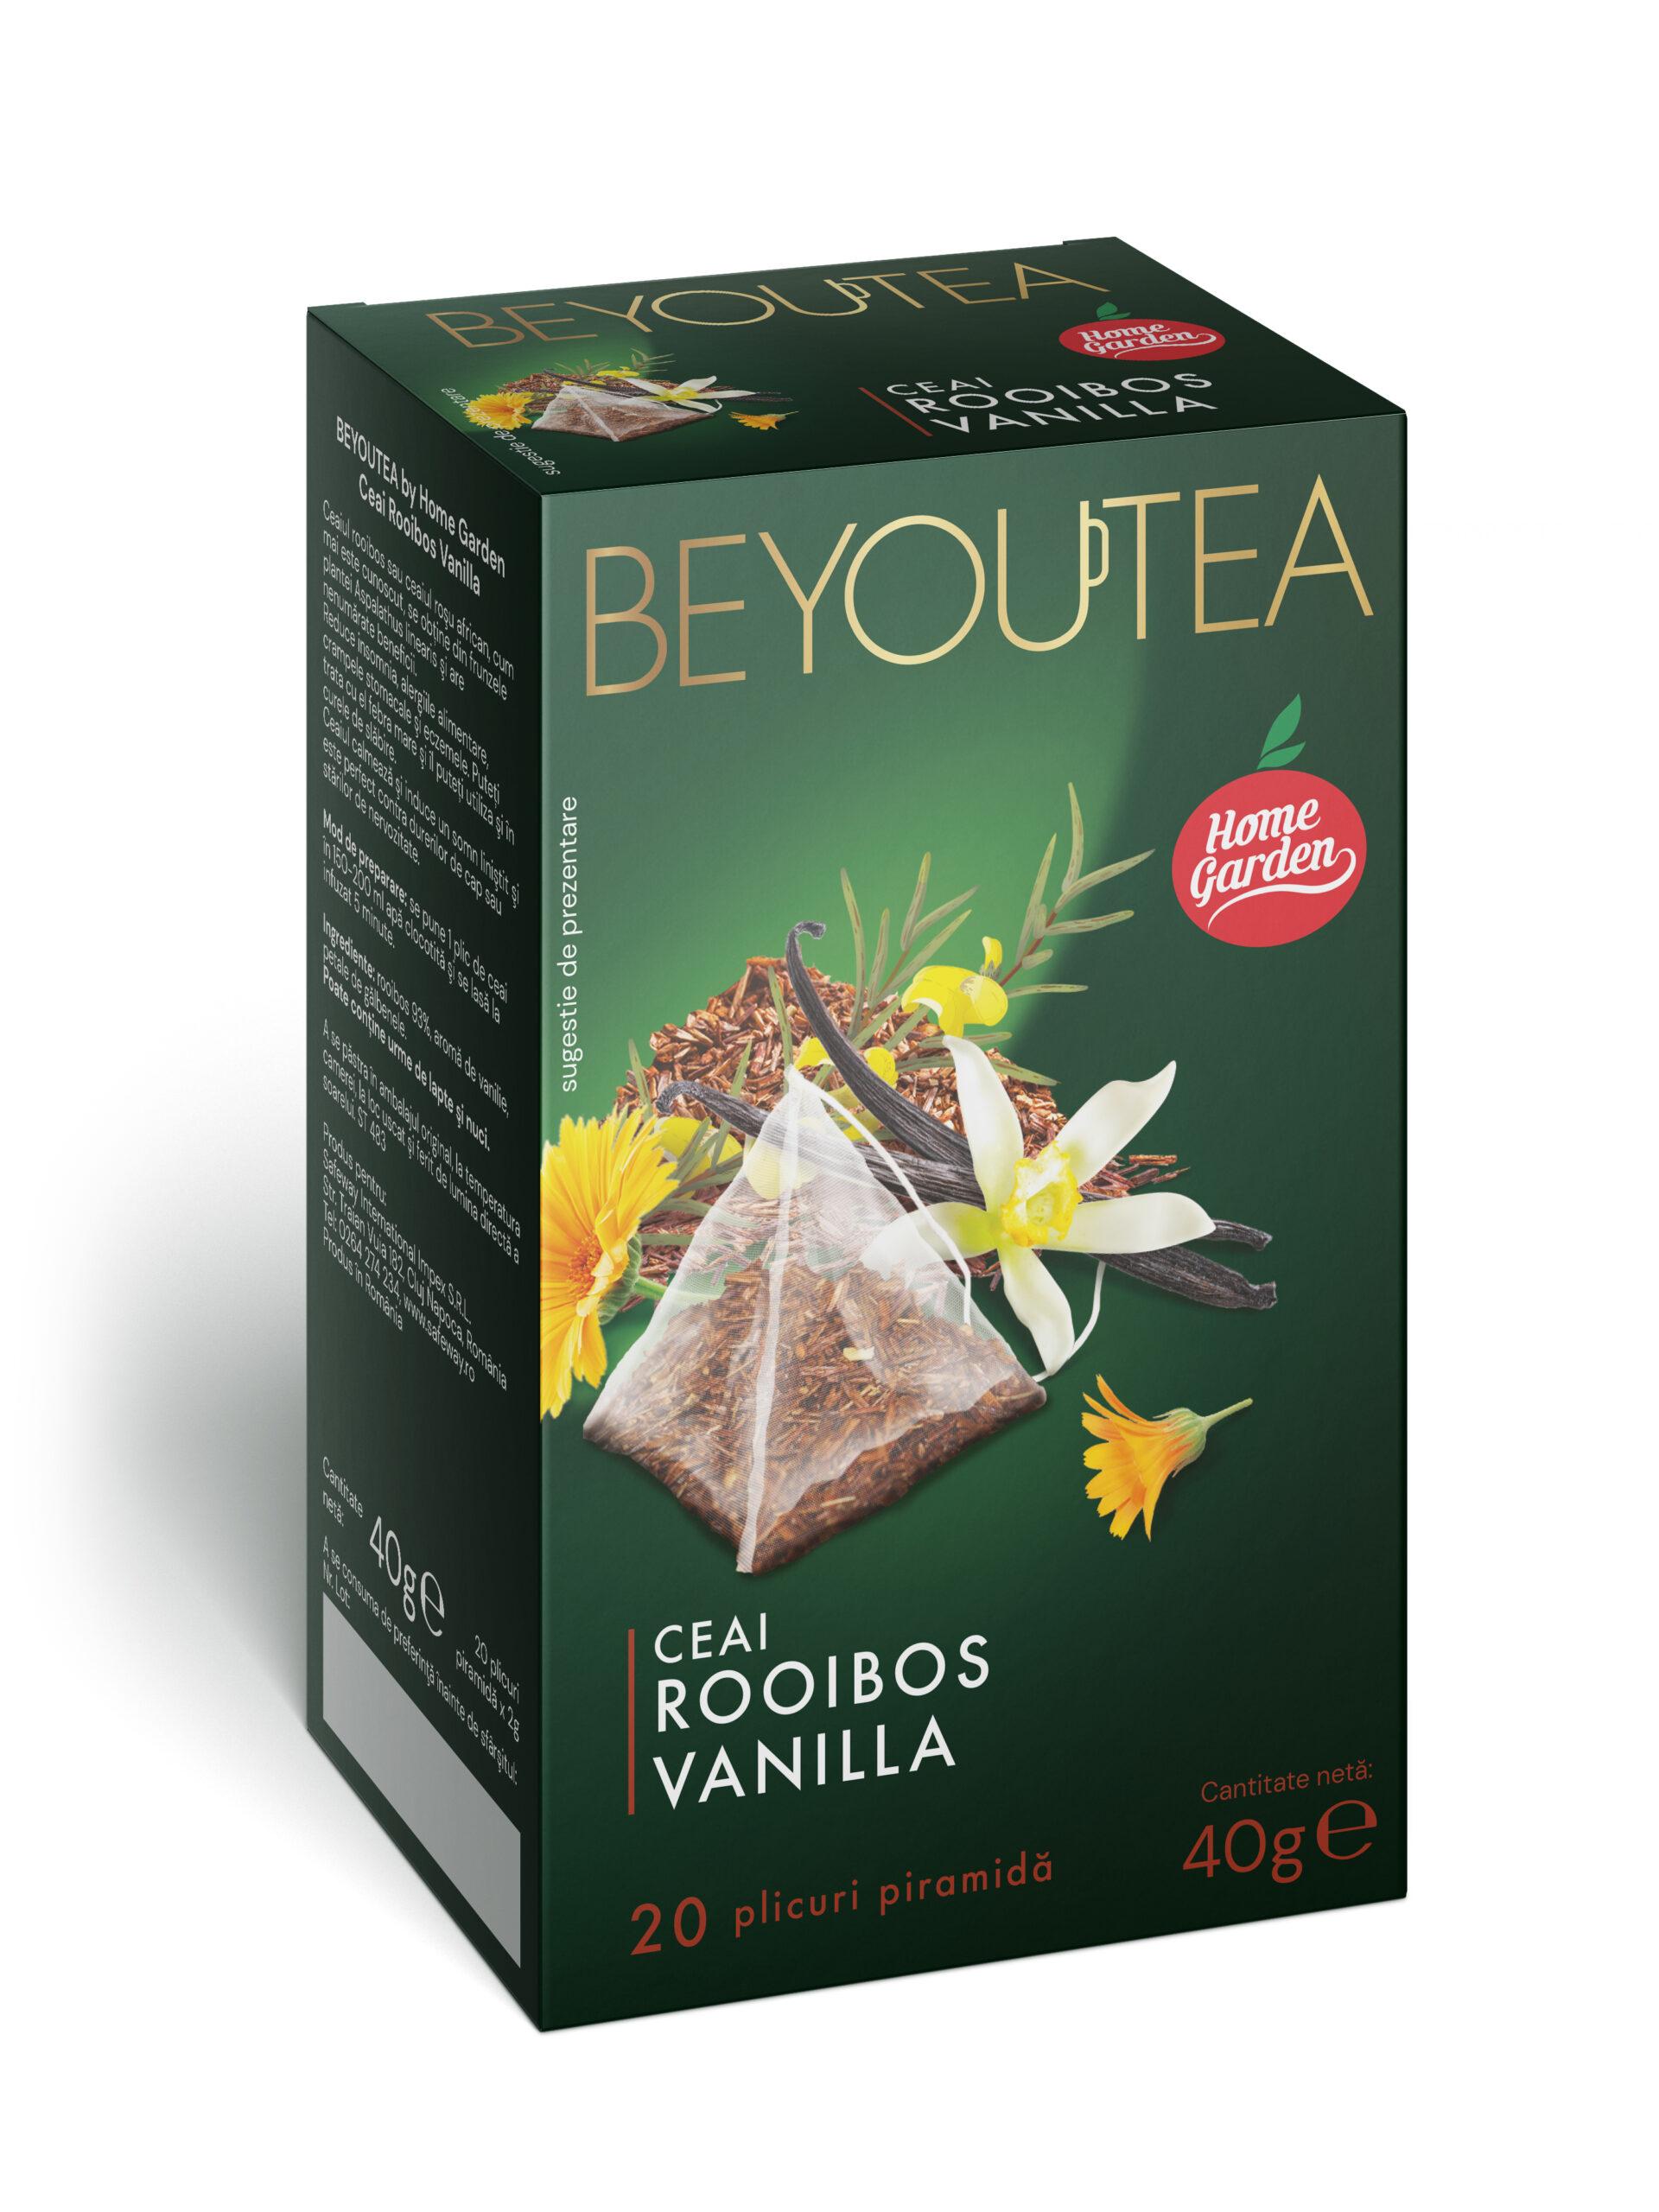 BEYOUTEA Premium Rooibos Vanilla